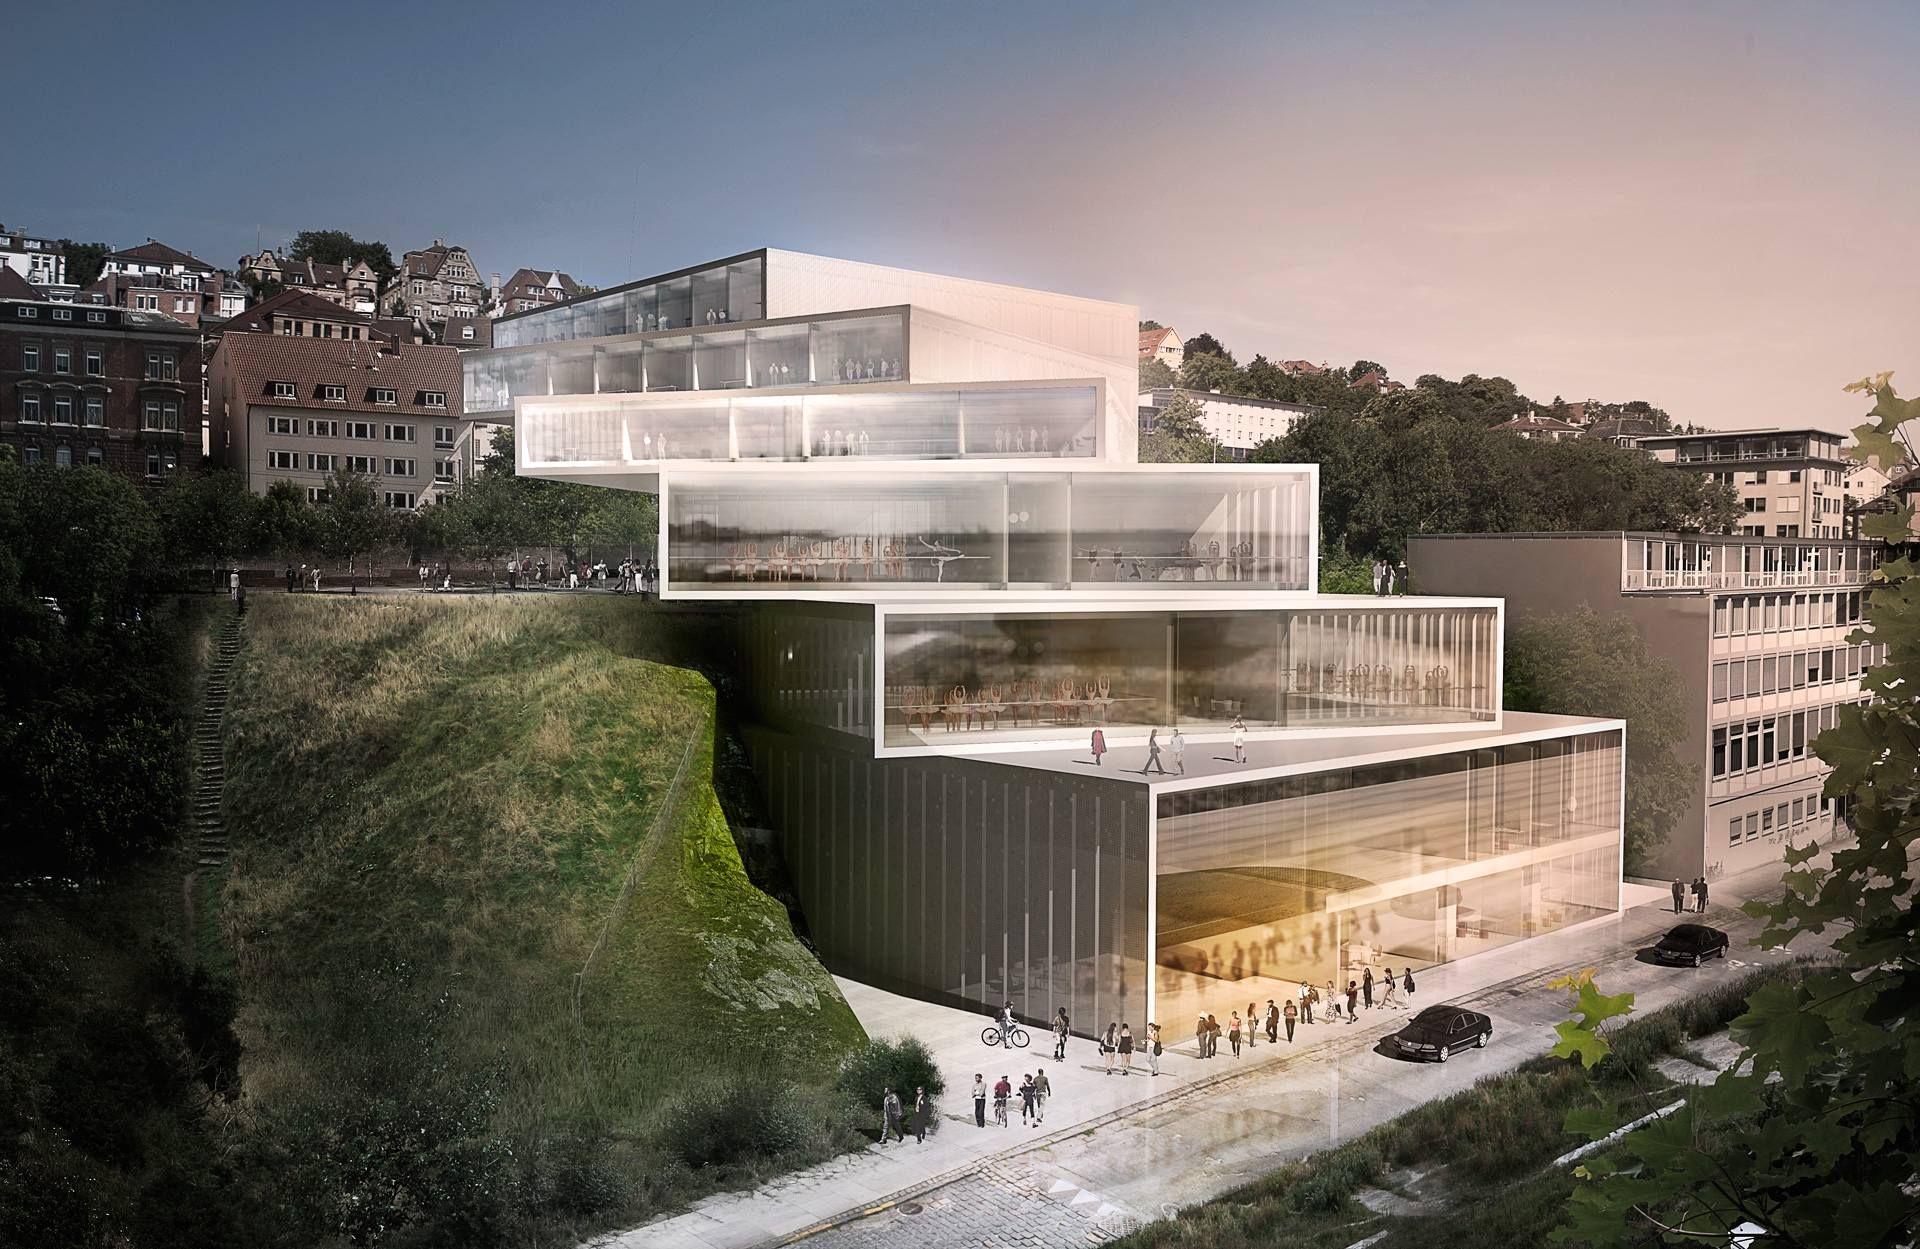 Architects Stuttgart 3xn cranko ballet 卒業制作のアイディア